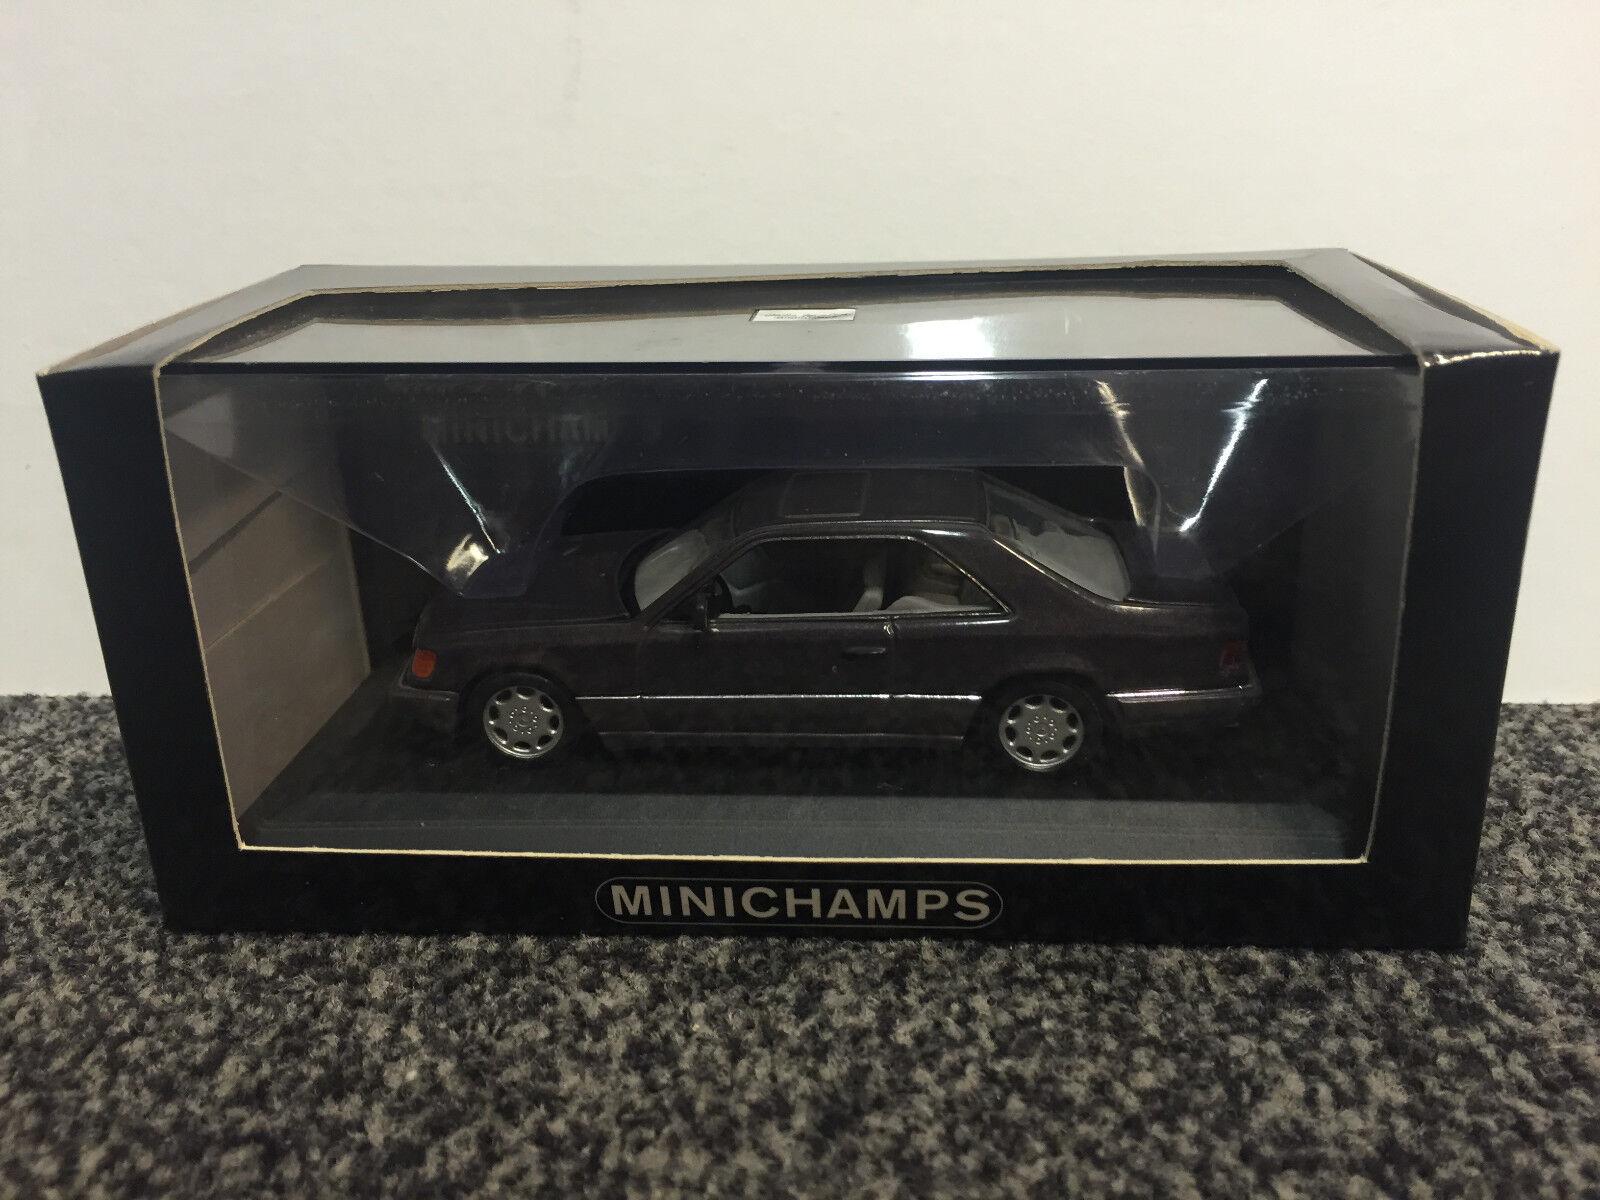 Mercedes-Benz MB E-Class E-Klasse Coupé 1994 Bornite Metallic 1 43 Minichamps